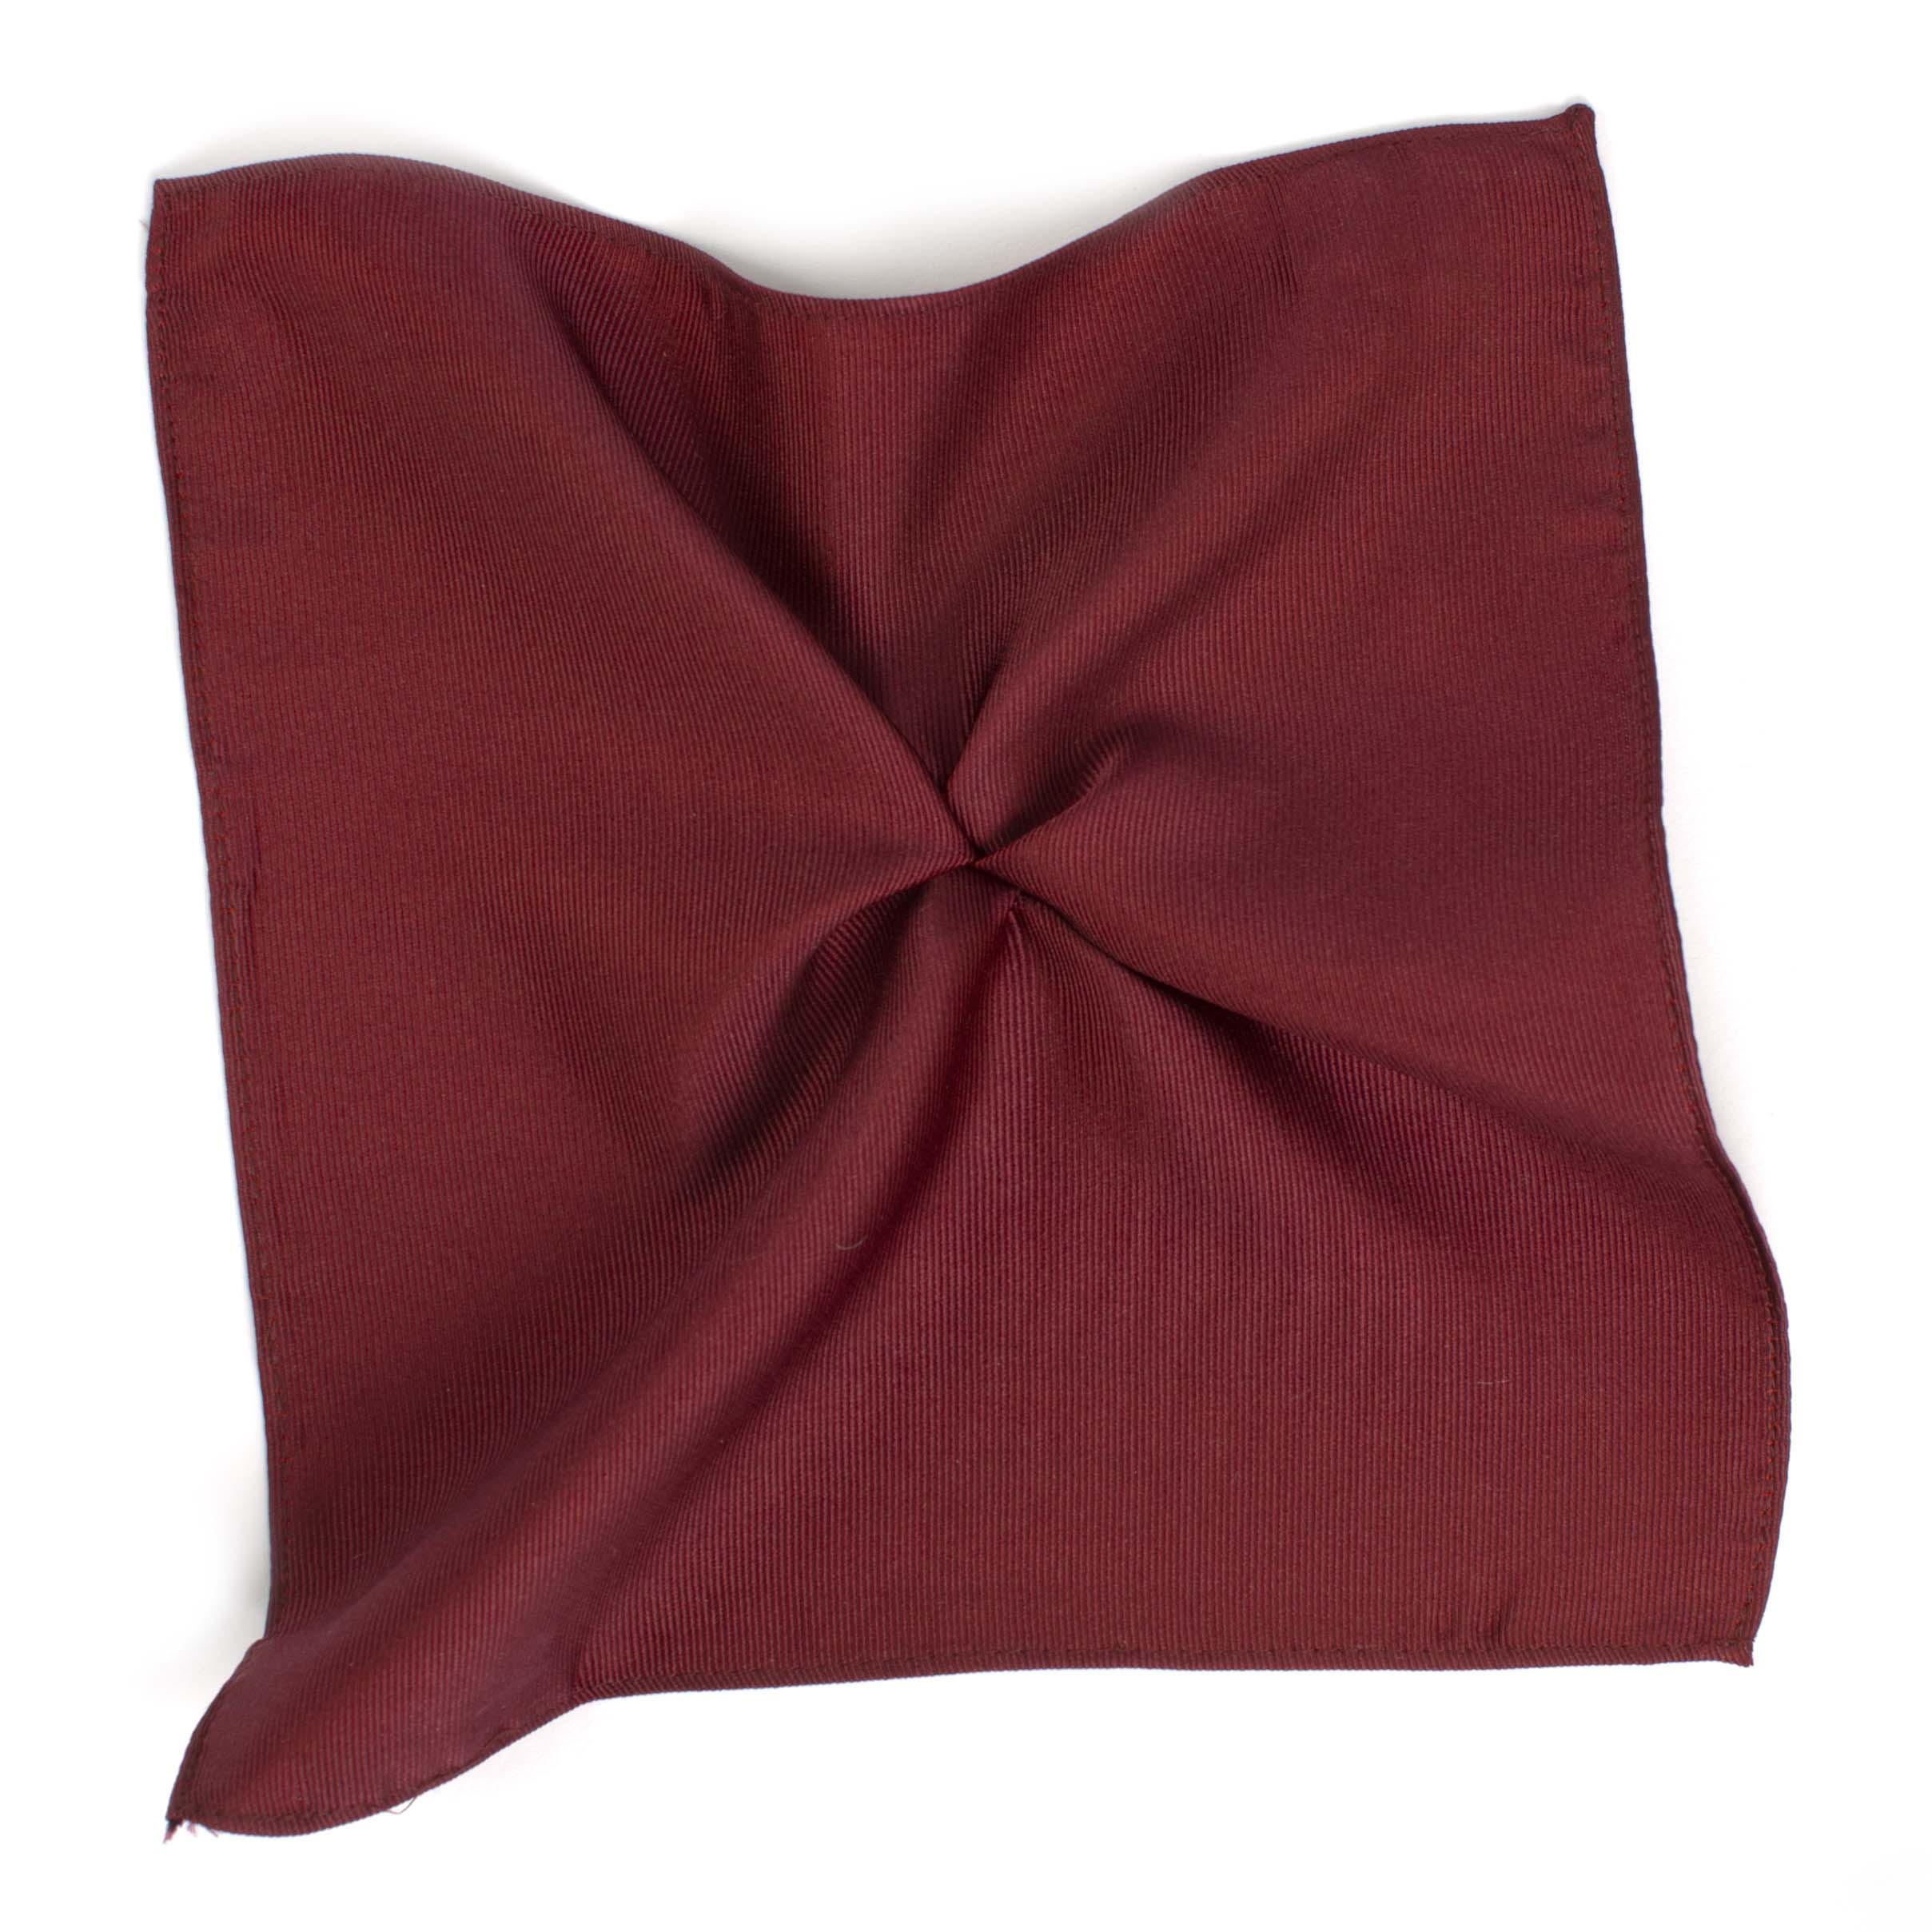 Pocket square classic burgundy ribbed